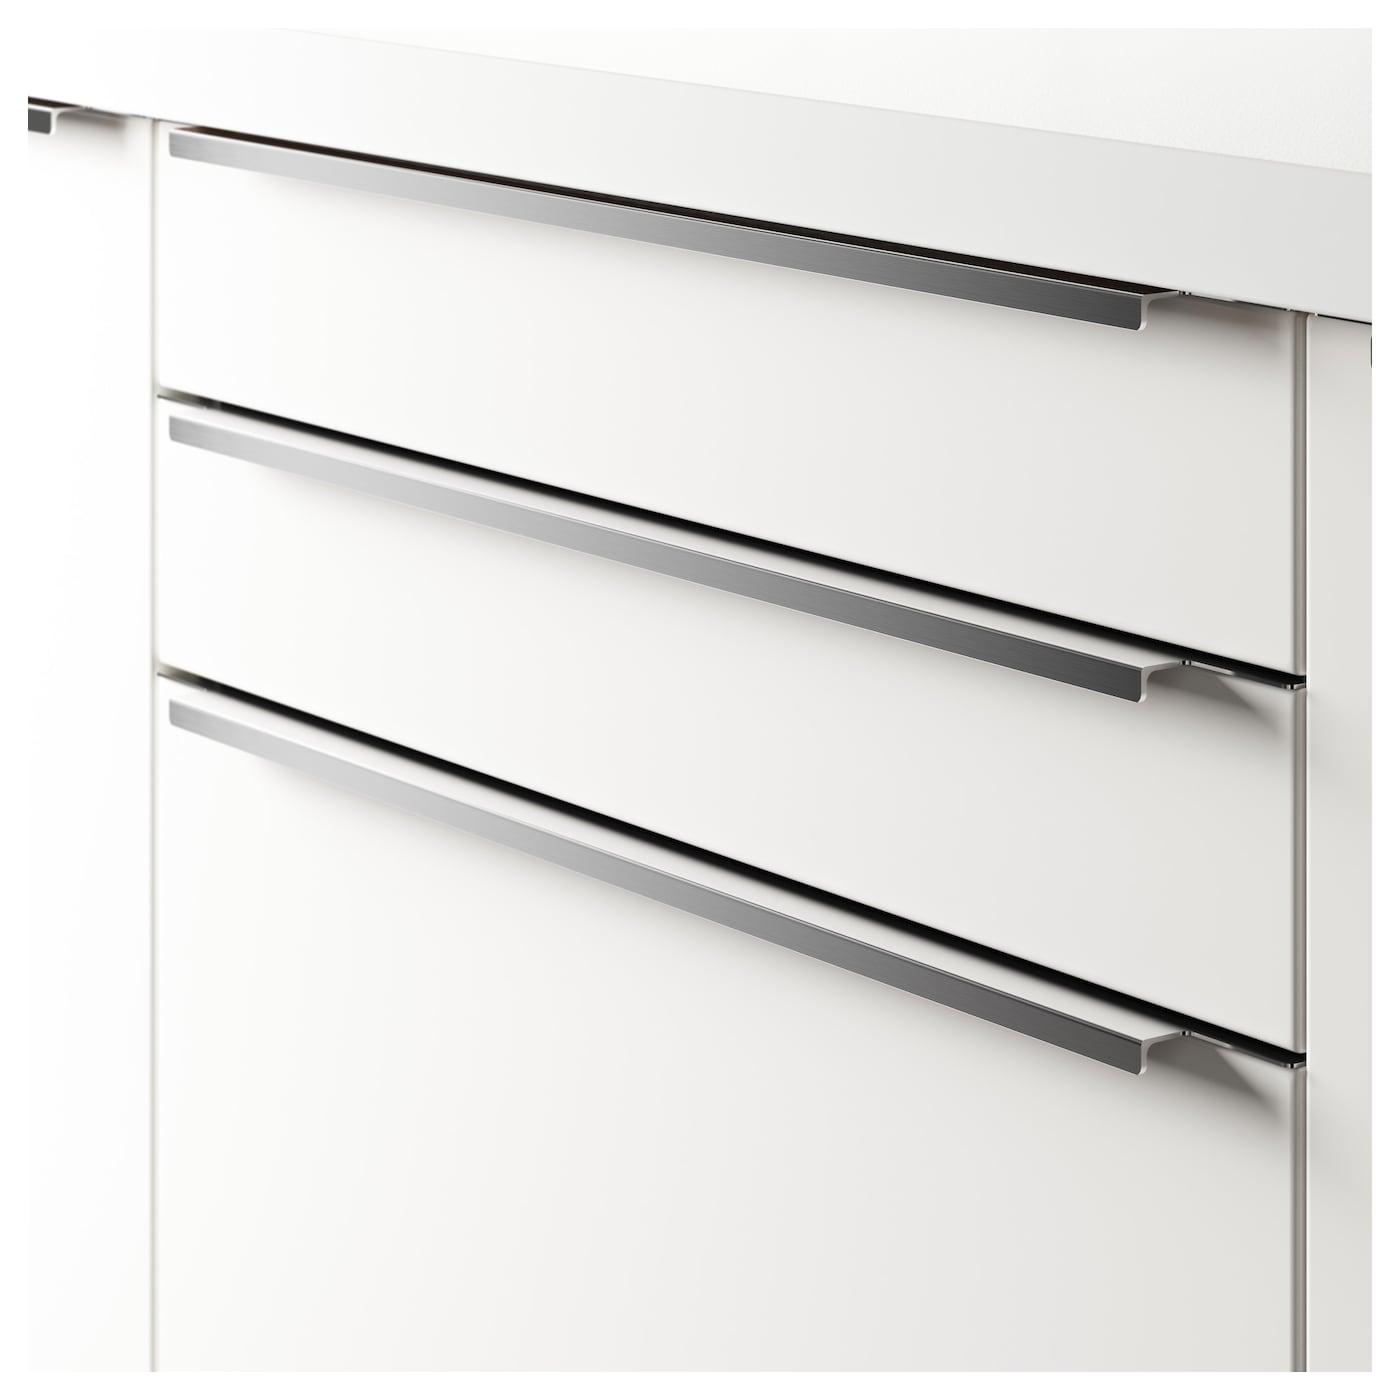 blankett handle aluminium 595 mm ikea. Black Bedroom Furniture Sets. Home Design Ideas